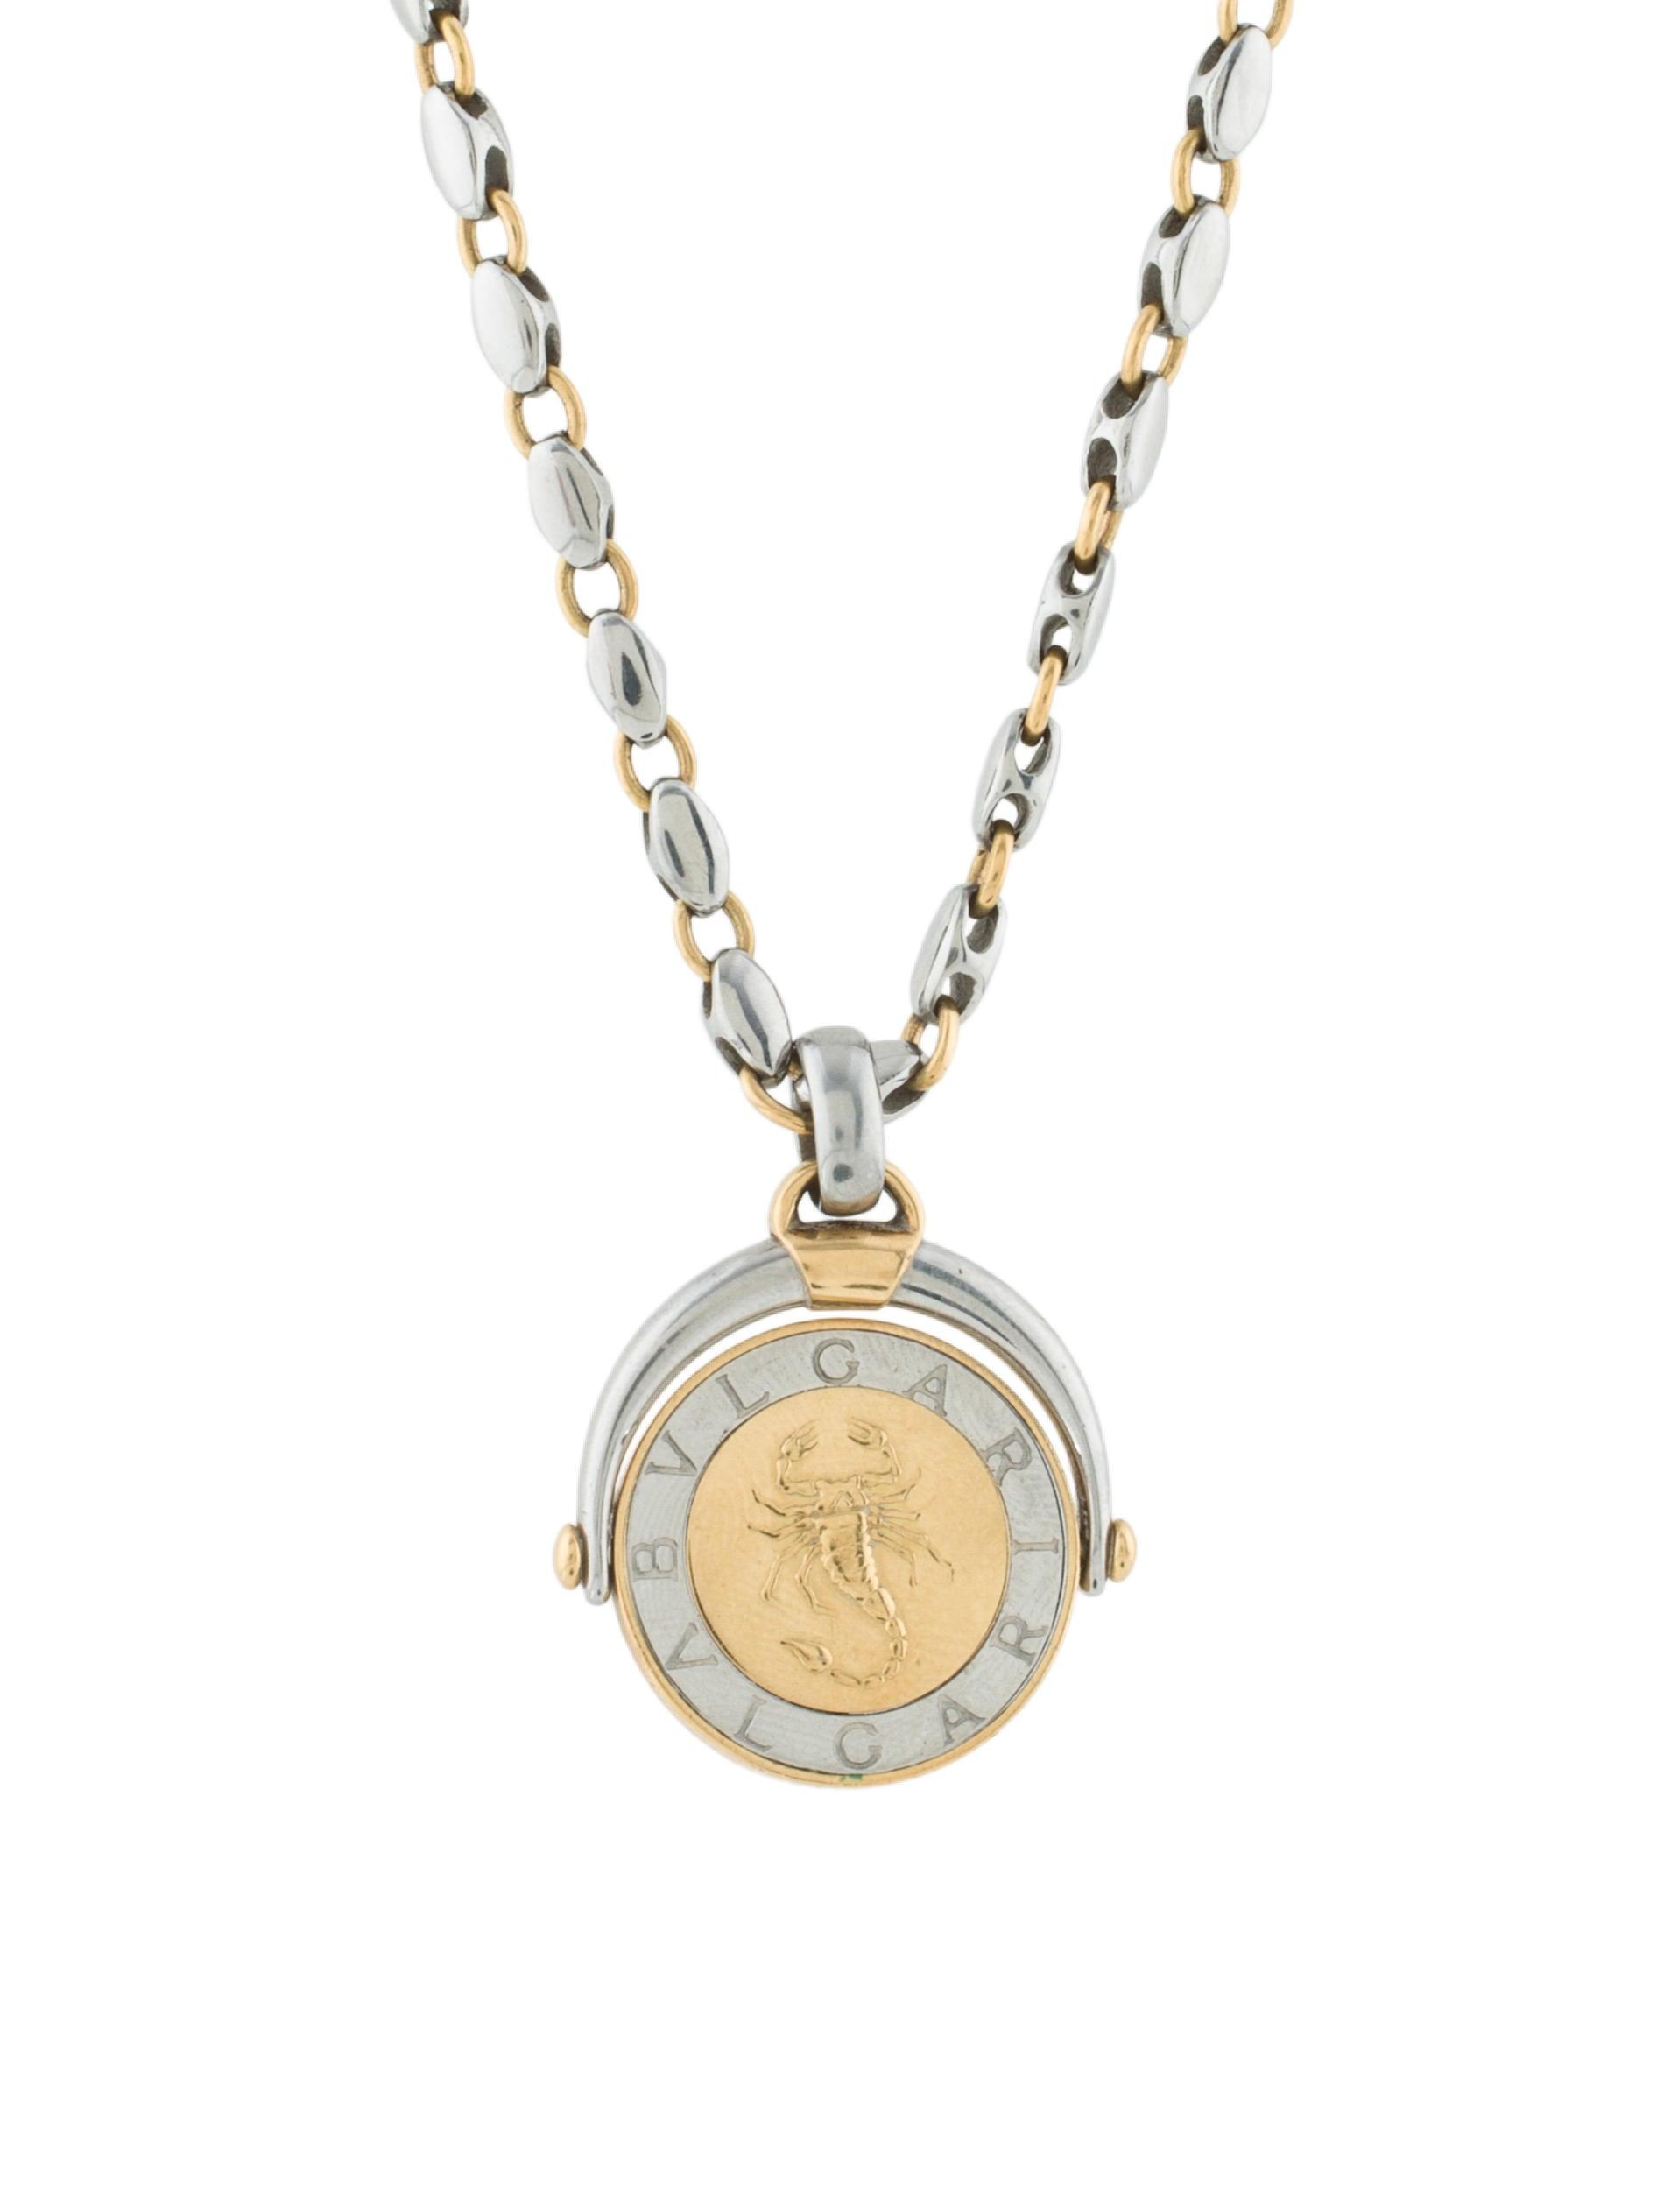 Bvlgari two tone zodiac pendant necklace necklaces bul25456 two tone zodiac pendant necklace mozeypictures Images